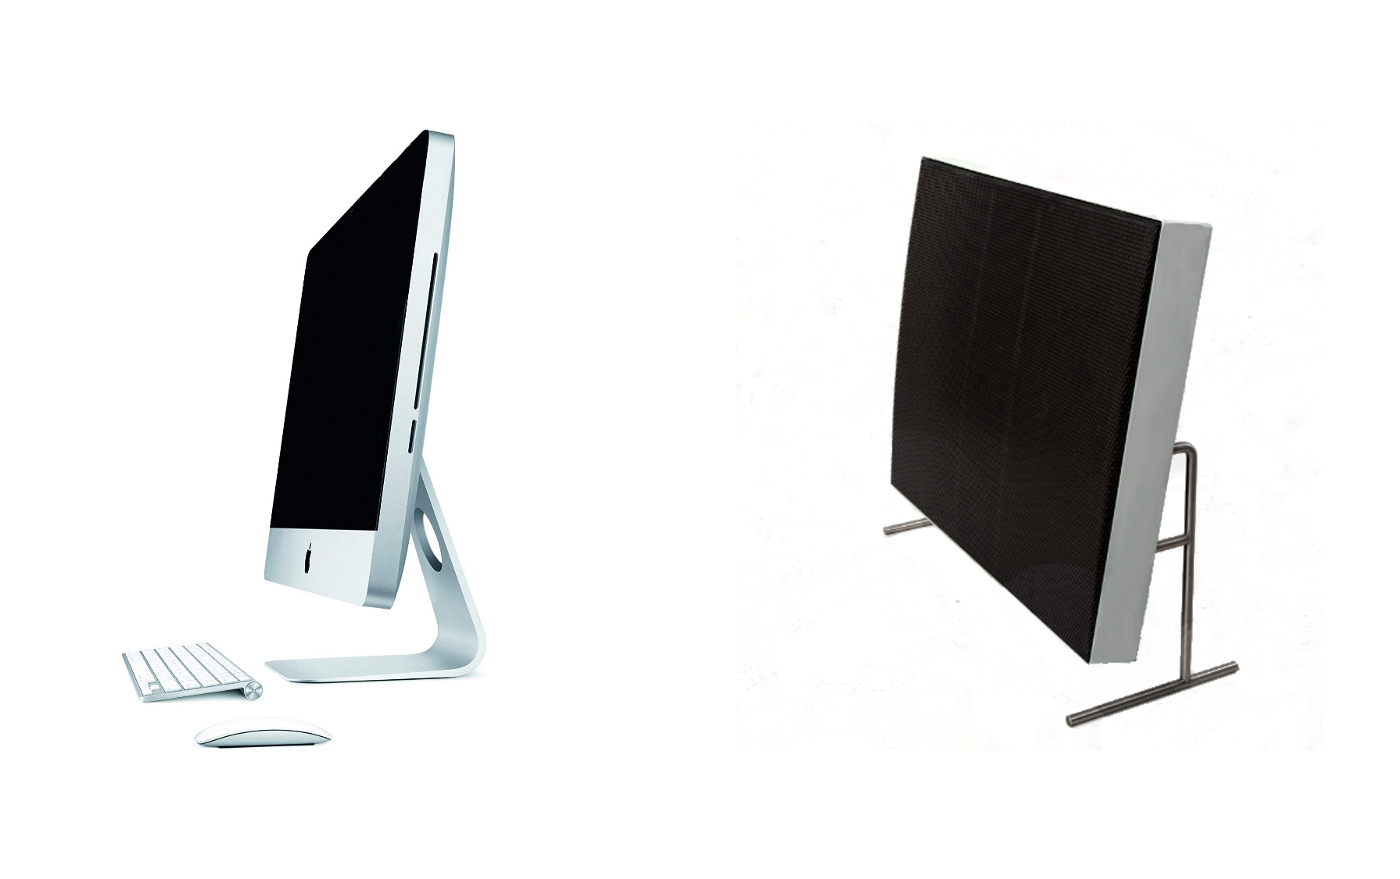 Apple iMac (2012) and Braun LE4 (1959)